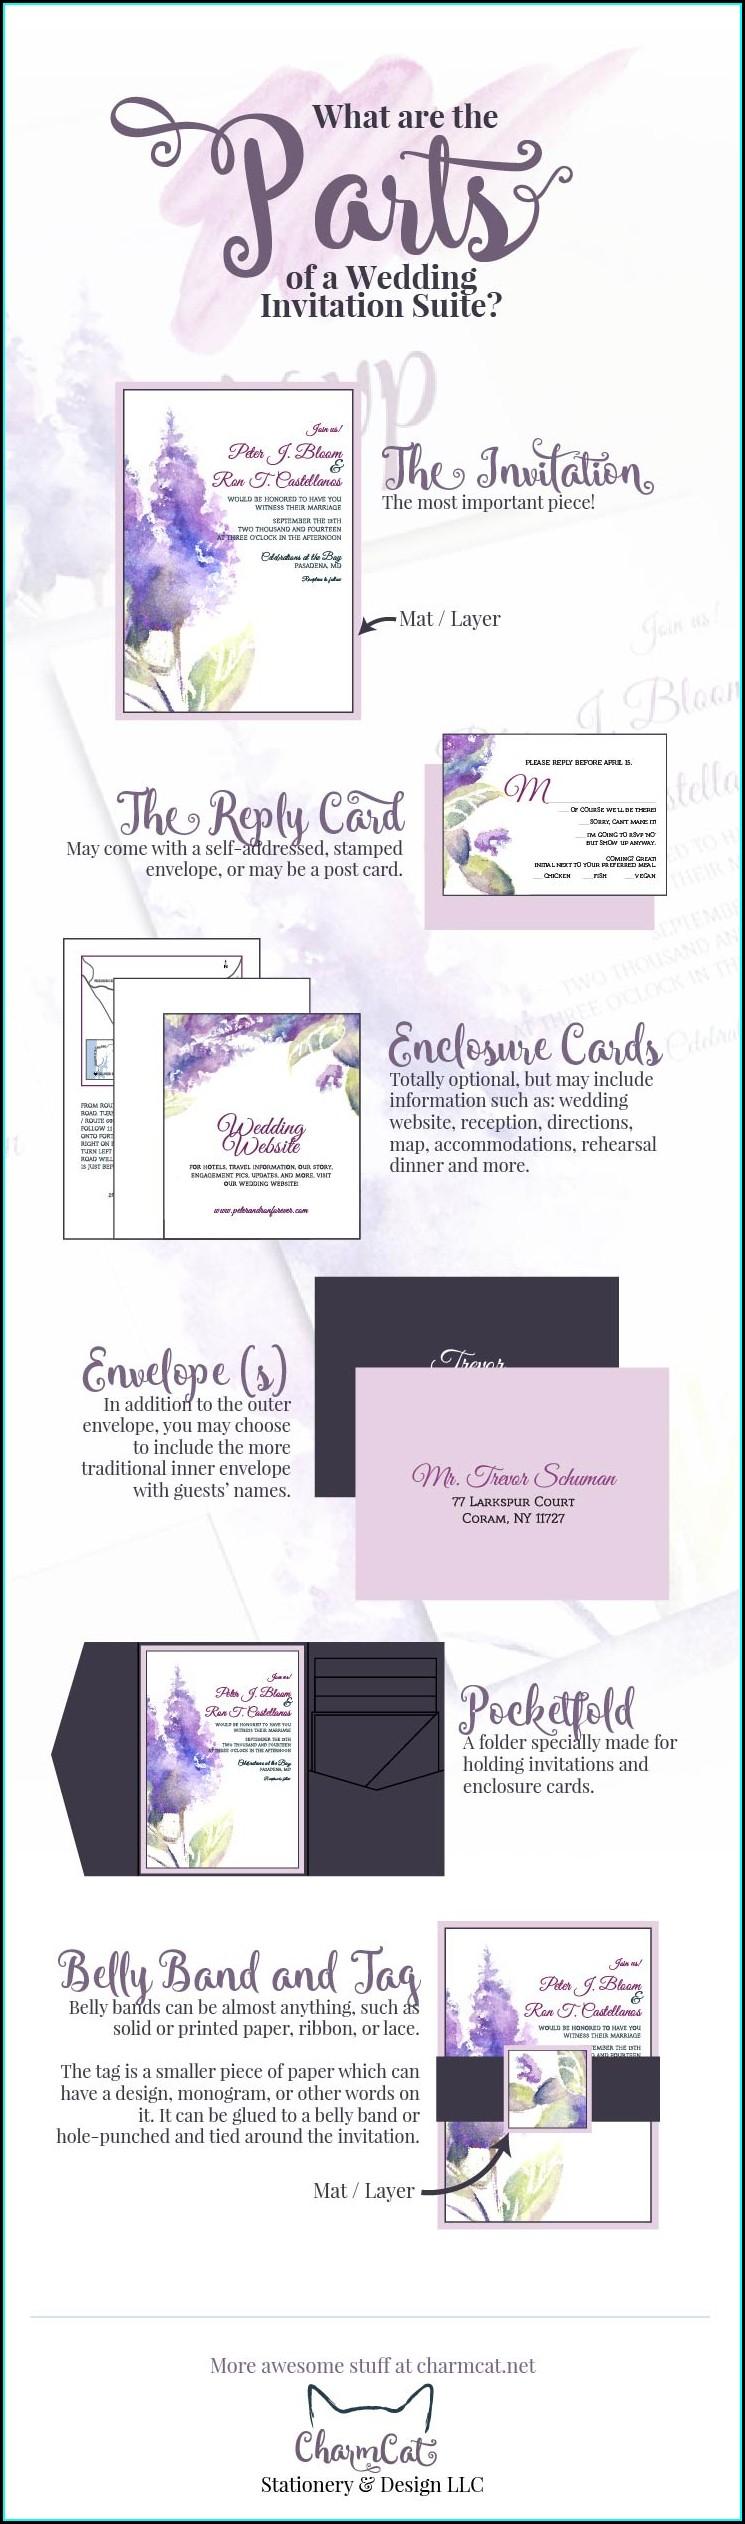 Wedding Invitation Suite Components